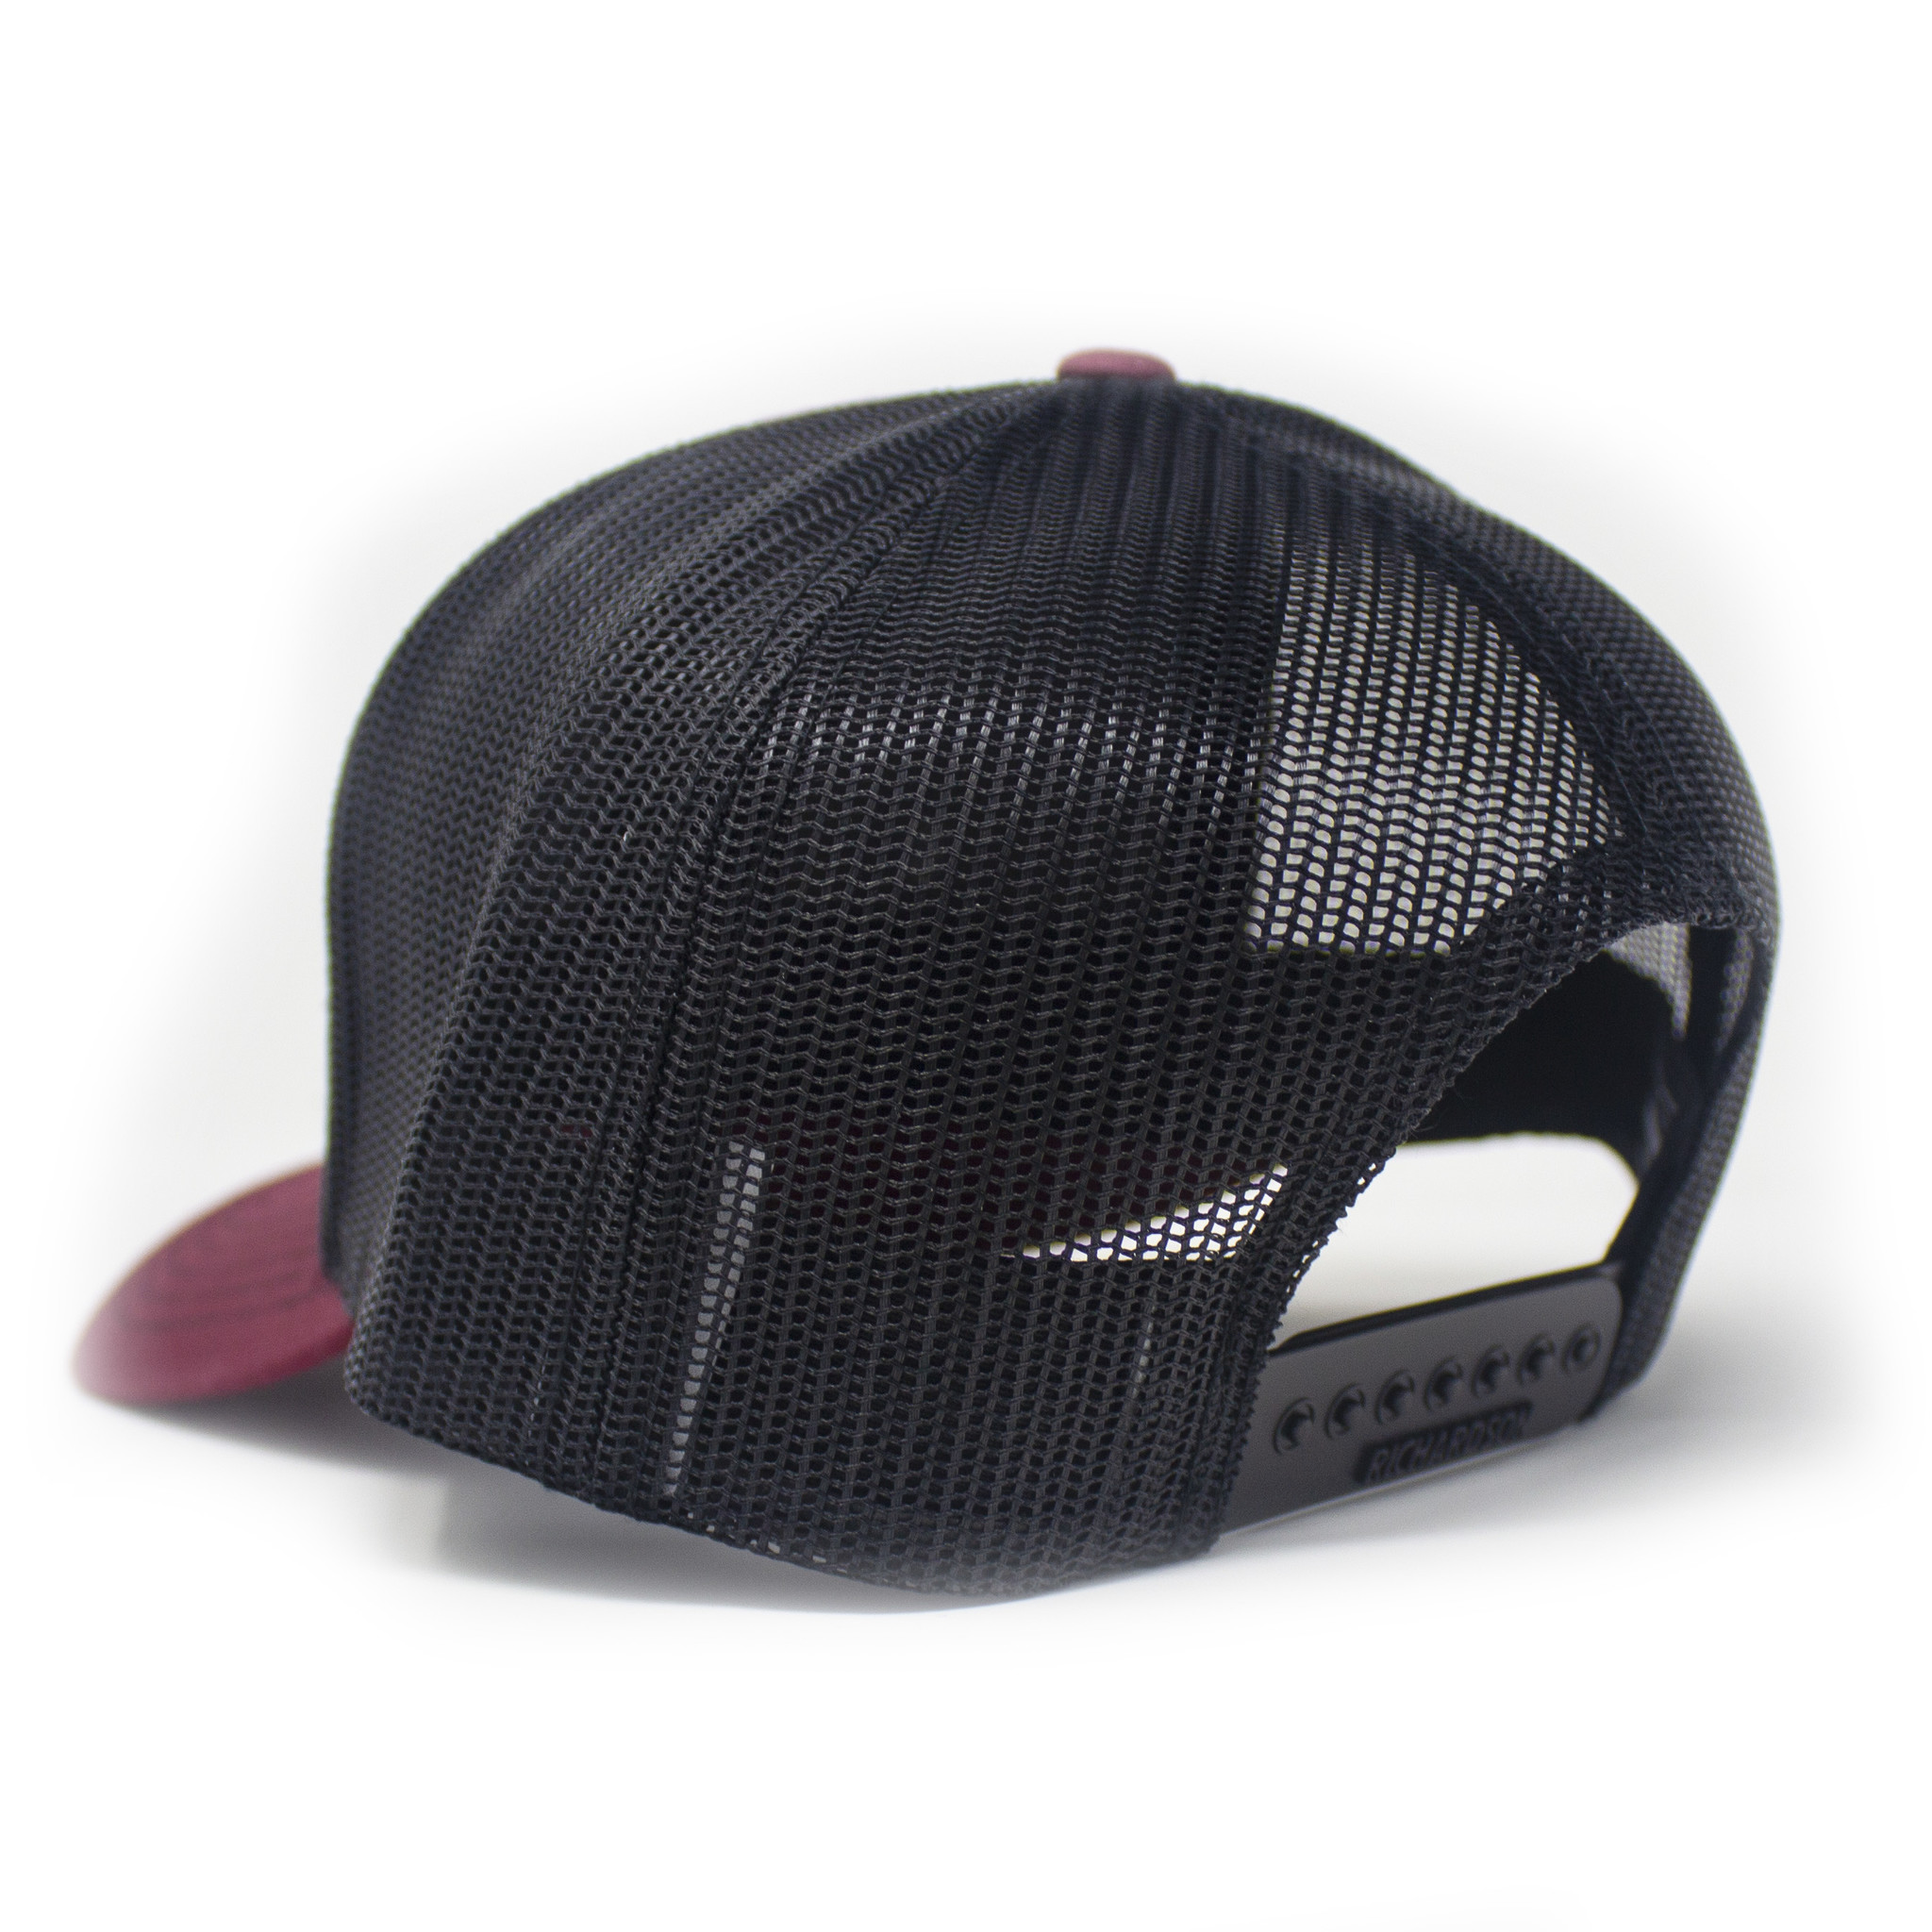 Blackbeard Leather Patch Lo Pro Trucker Hat, Cardinal and Black-2